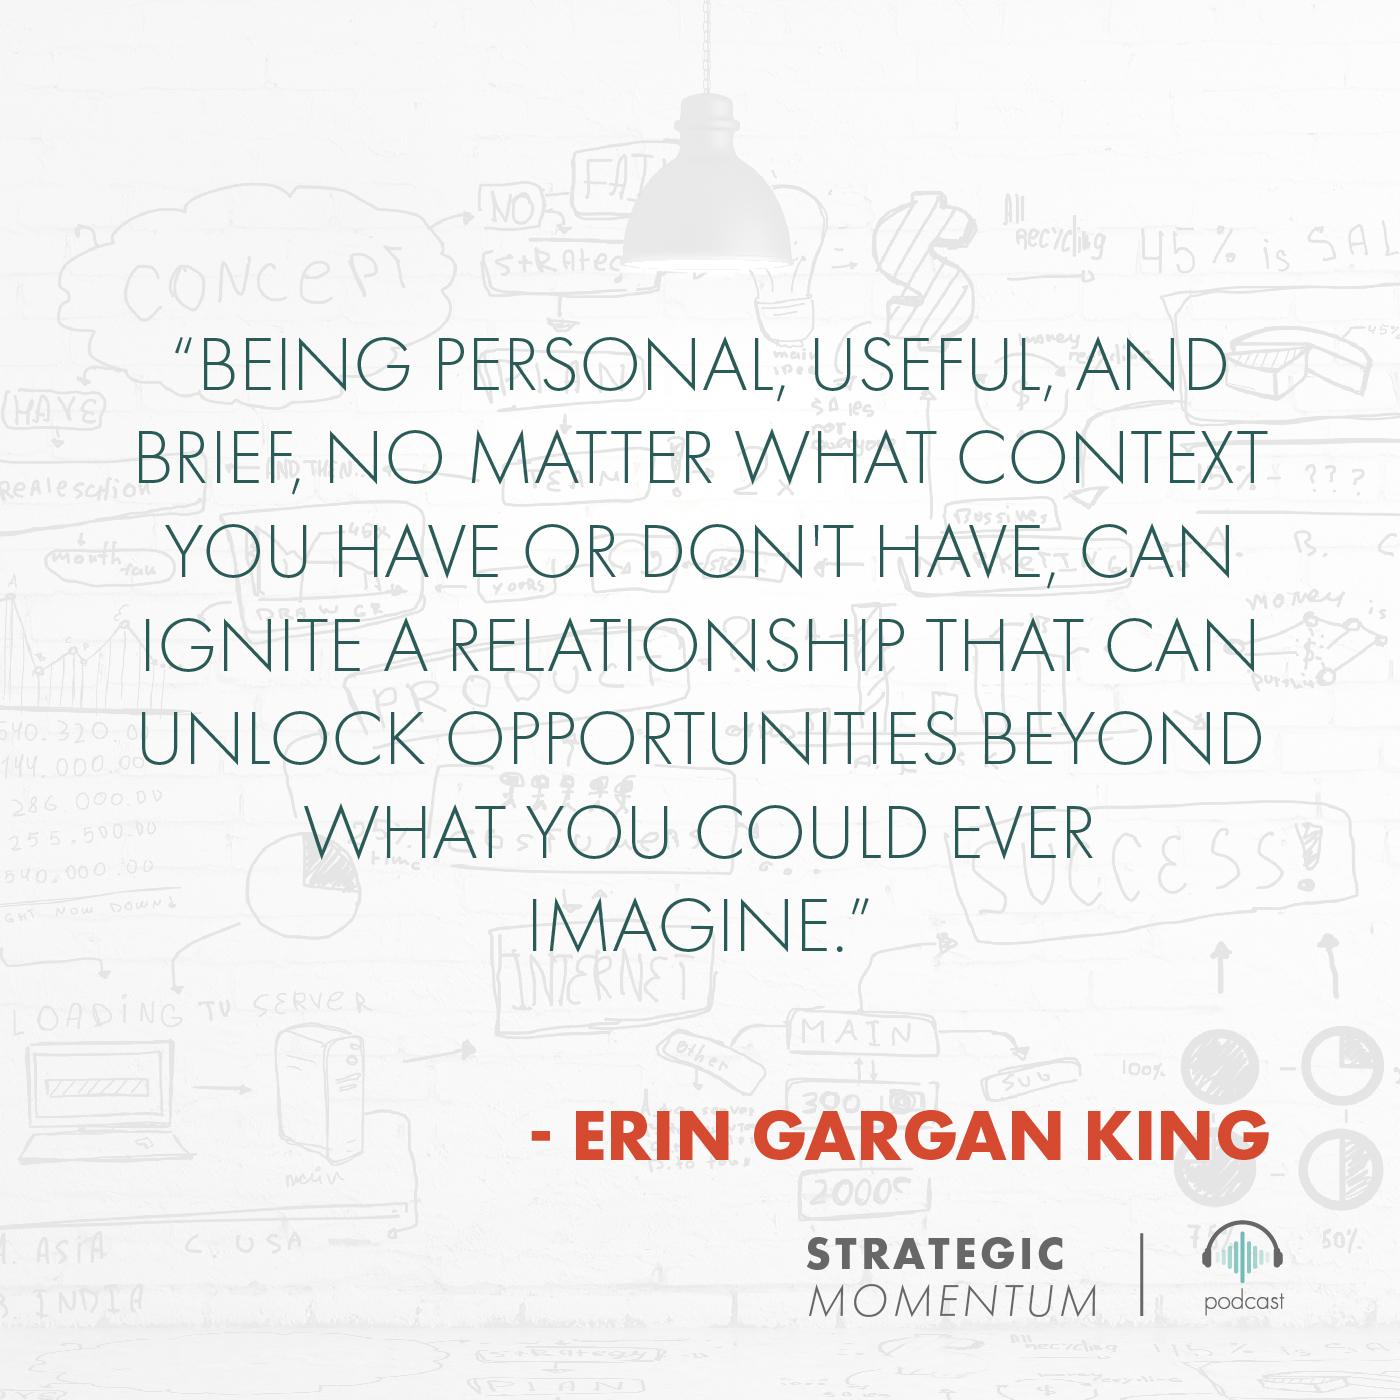 Erin Gargan King Quote | Strategic Momentum Podcast